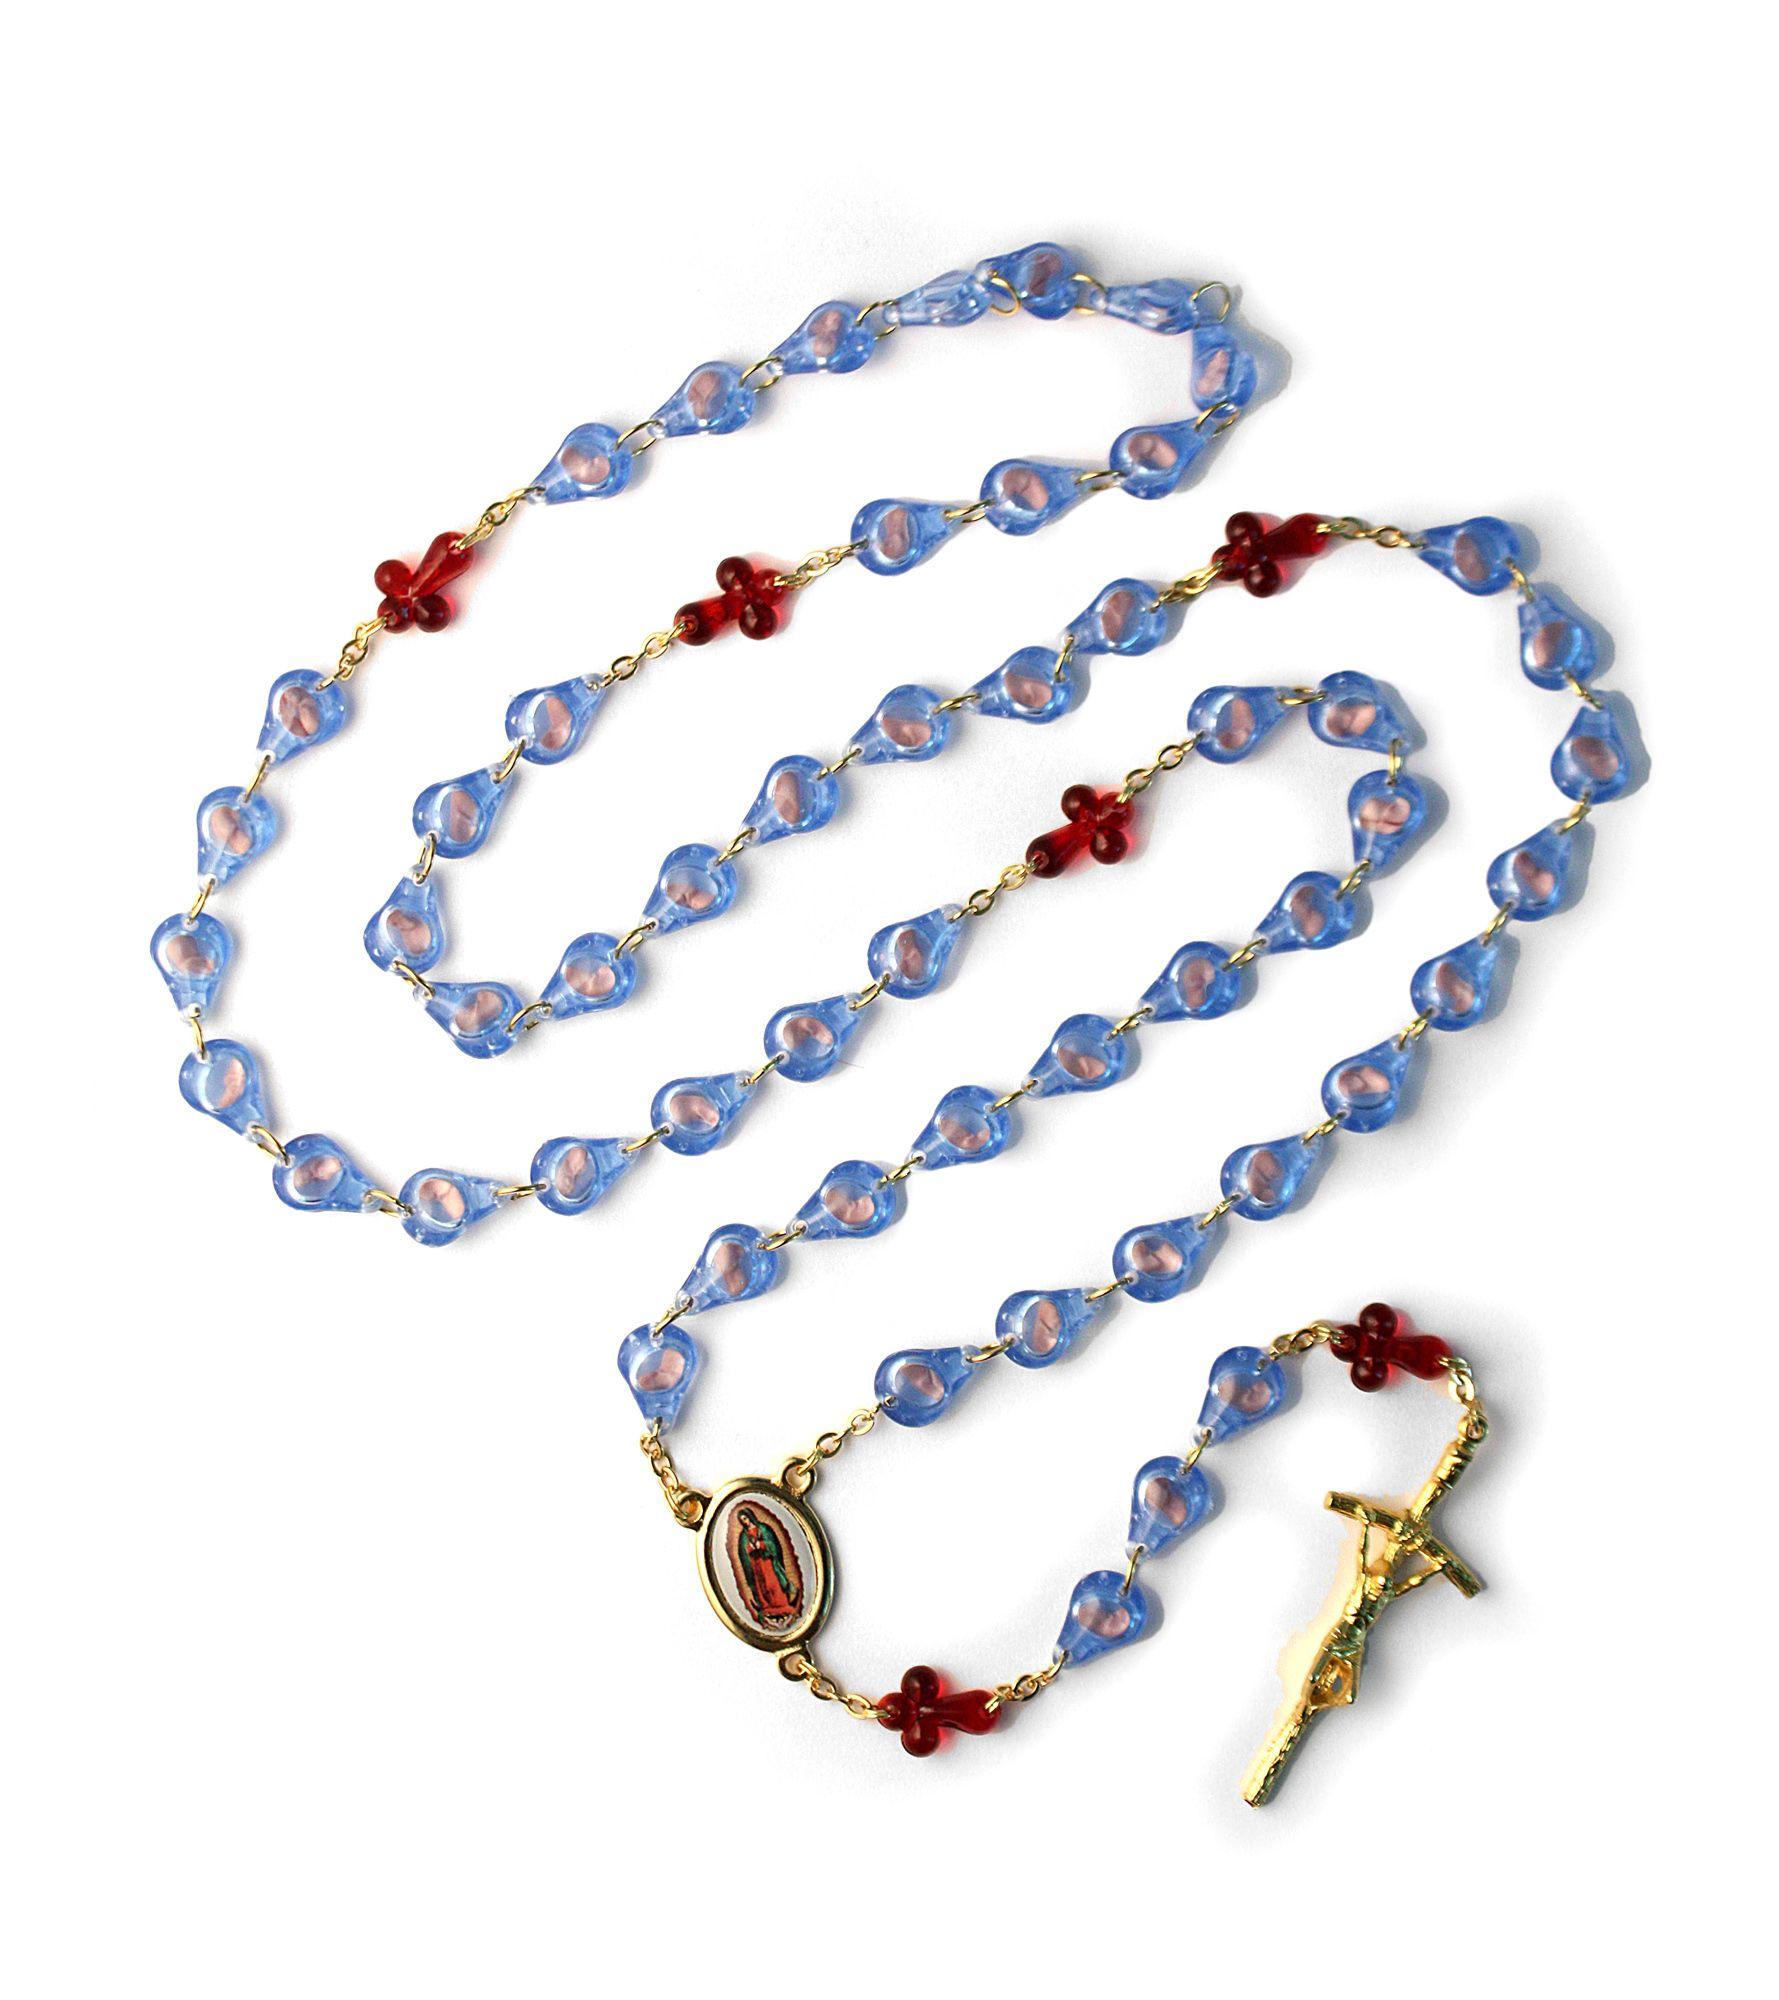 Prolife Rosary pro life, prolife, fetus rosary, anti abortion rosary, glass bead,